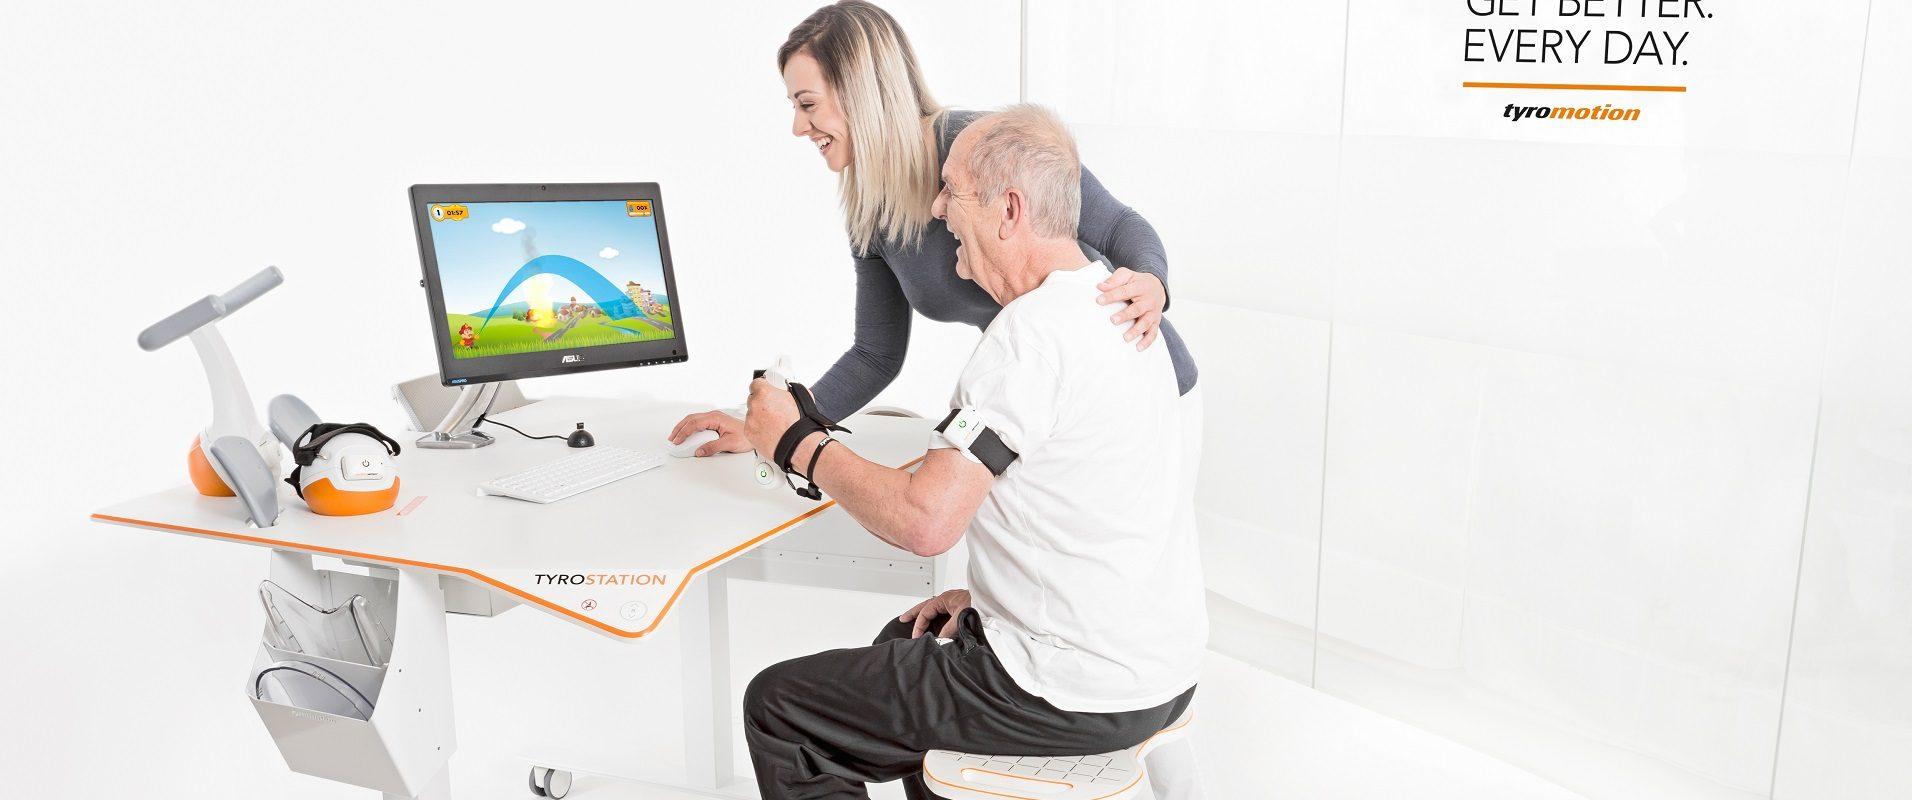 TYROSTATION in Therapieanwendung mit älterem Patient